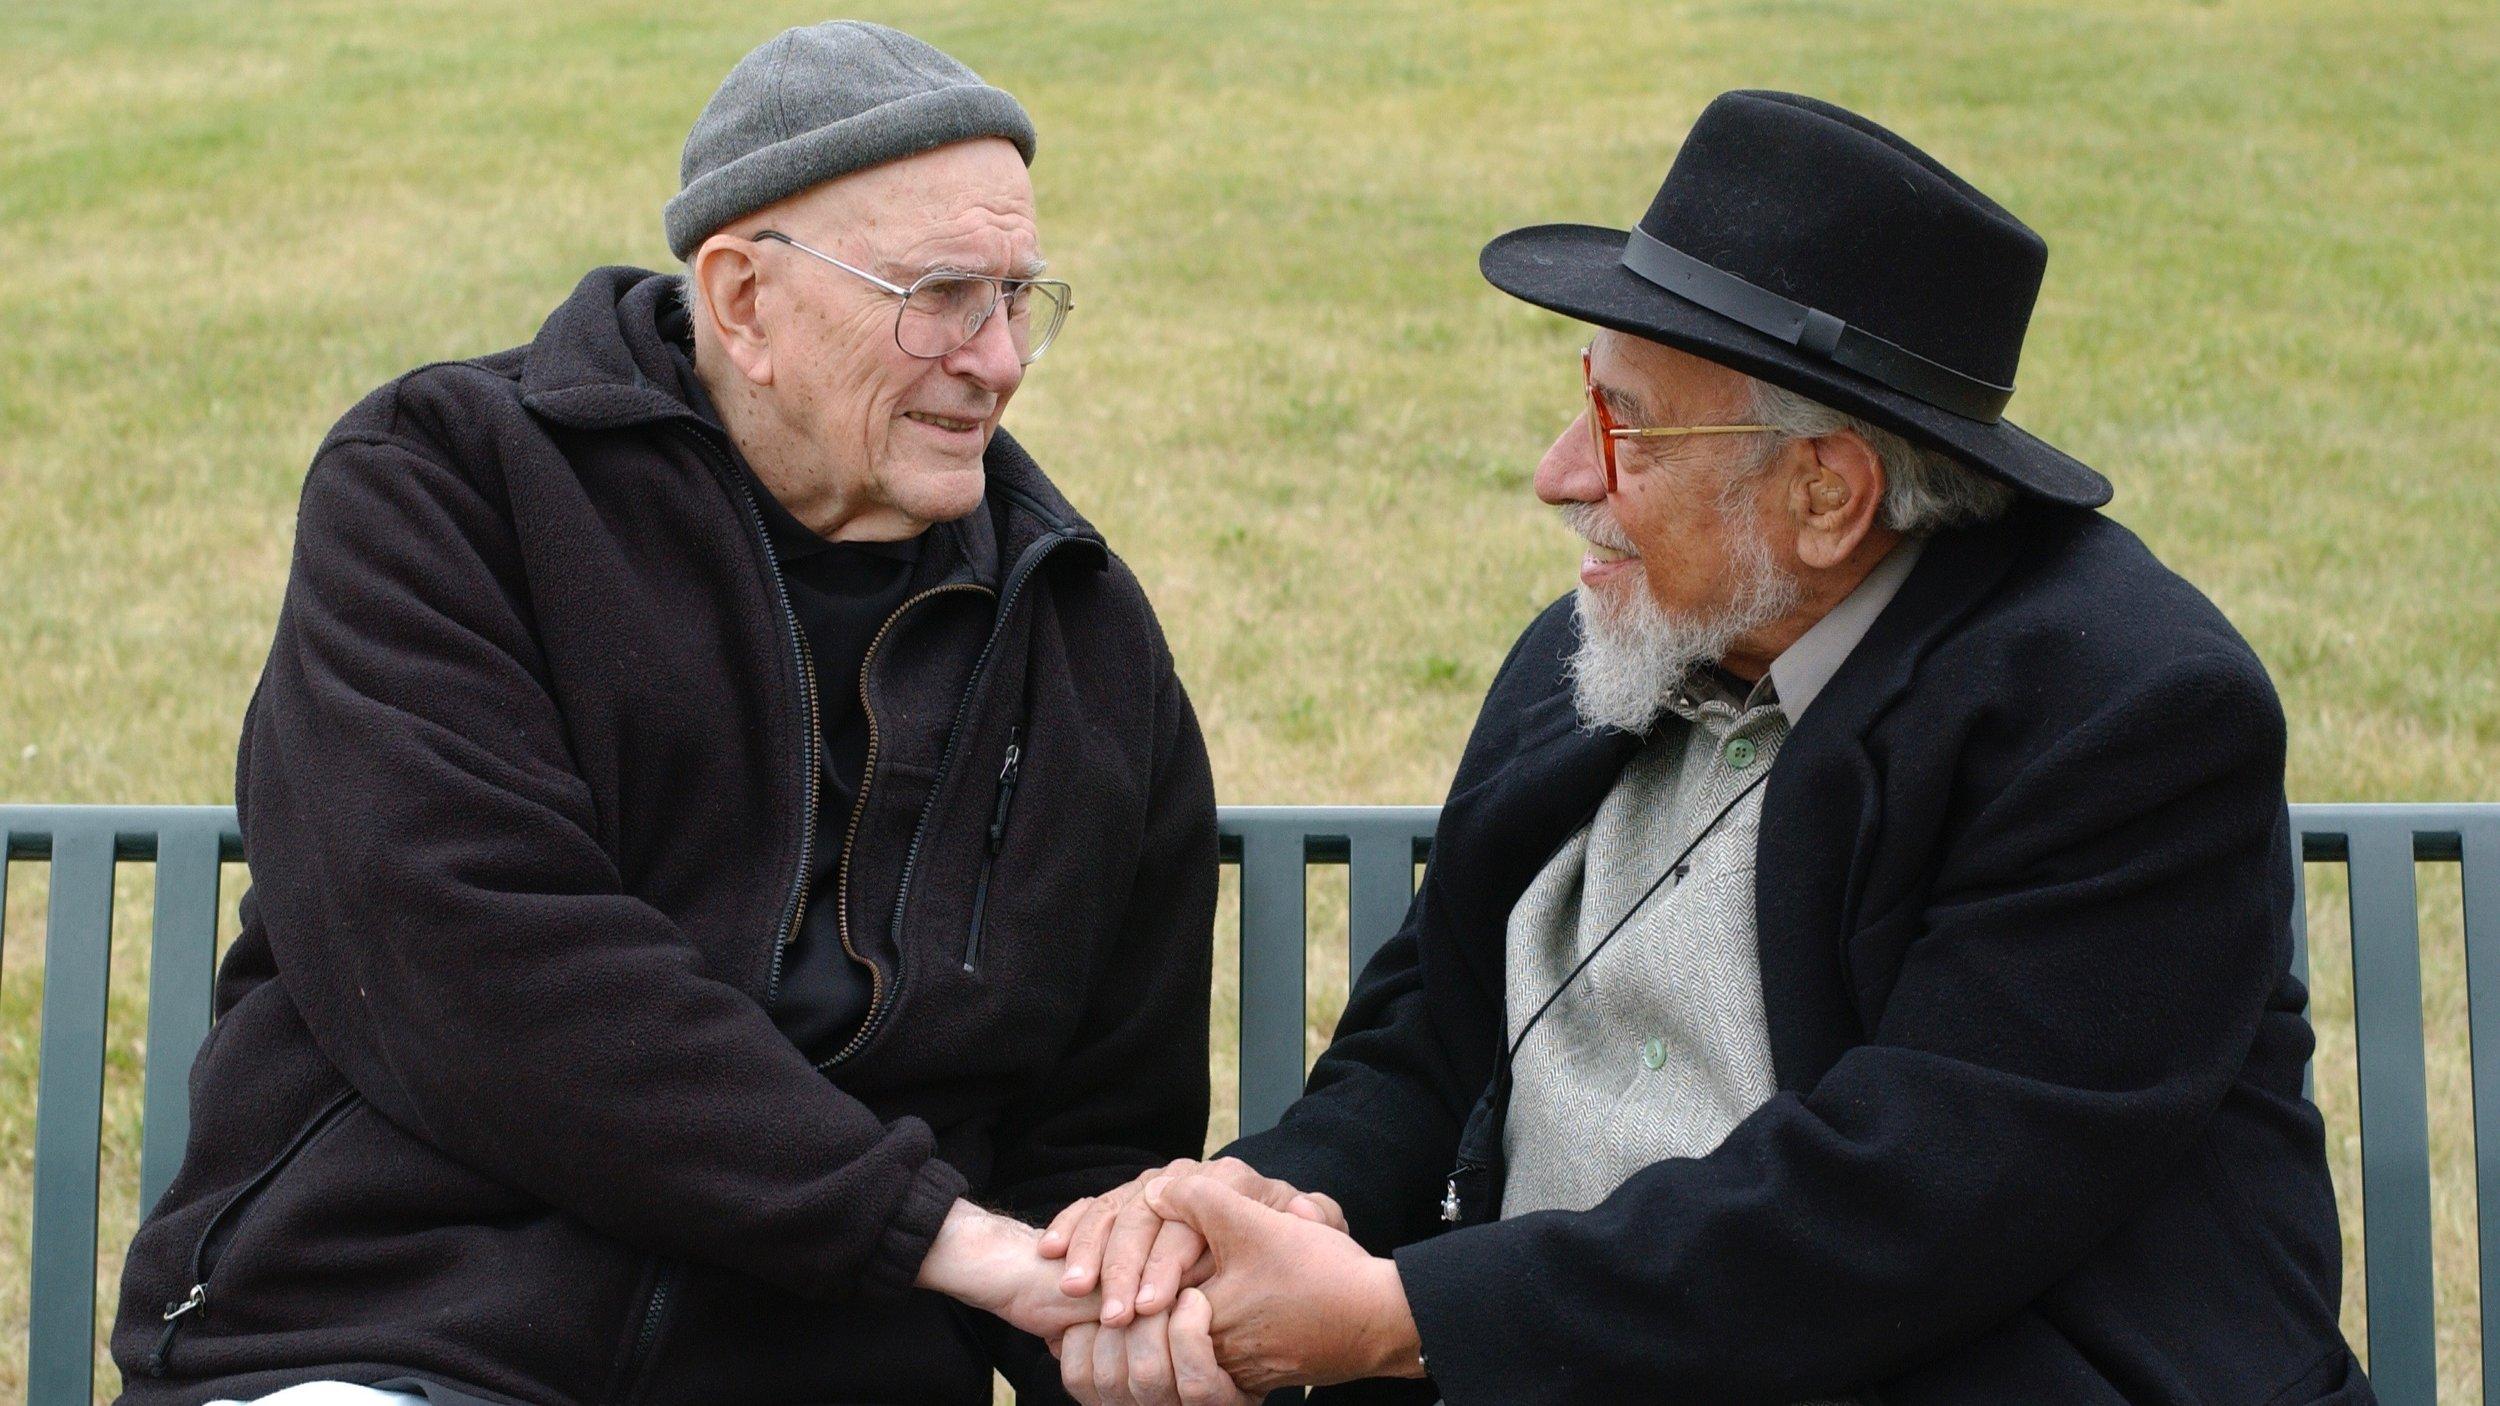 "Father Thomas Keating and Rabbi Zalman Schachter-Shalomi in Denver, Colorado, 2005, dialoguing on the ""Kiss of God."" Photo by Edis Jurcys, 2005."